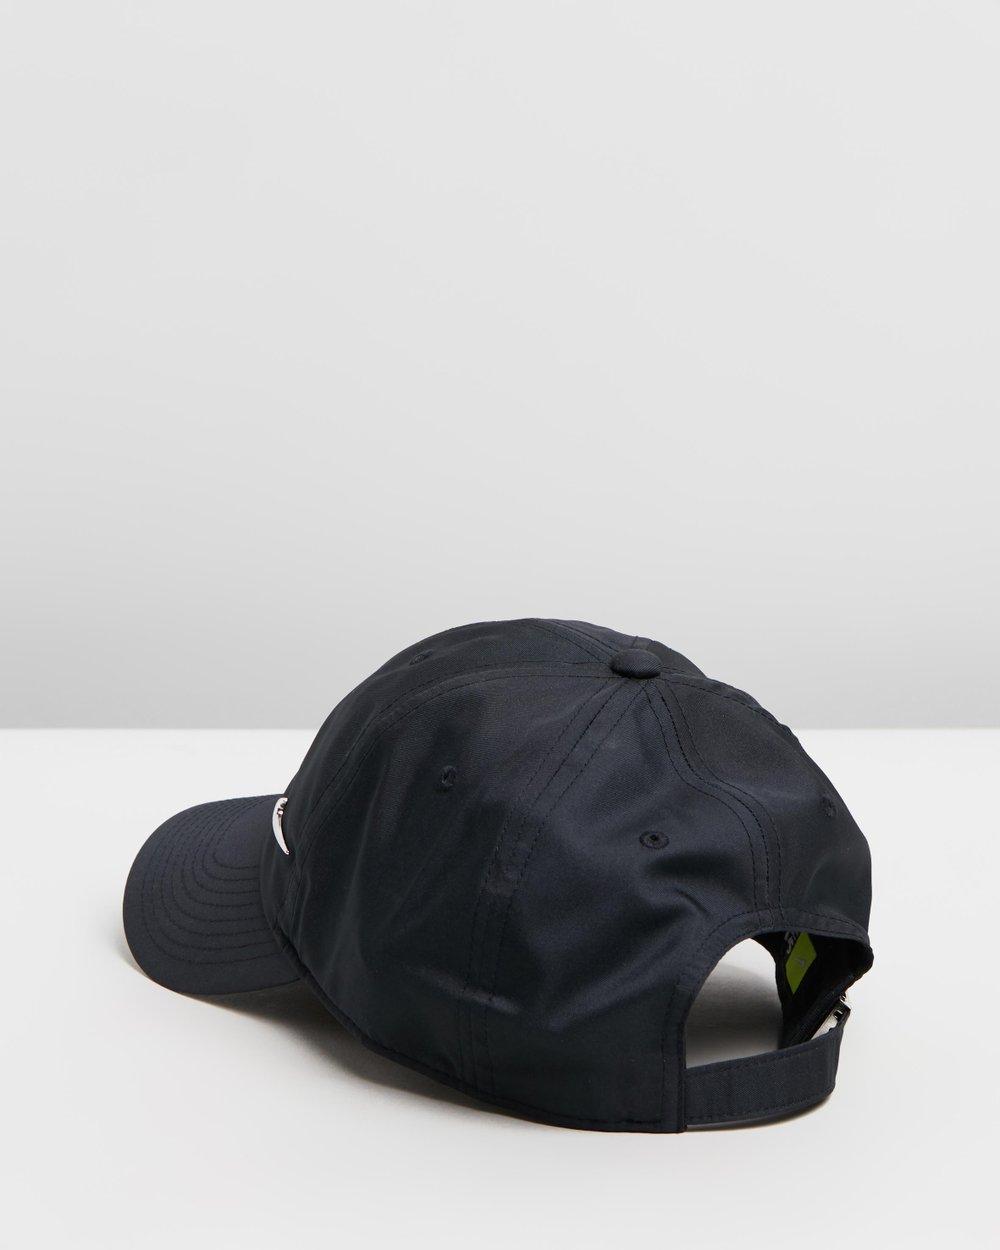 7d53f4db4c5 Heritage 86 Metal Swoosh Cap by Nike Online